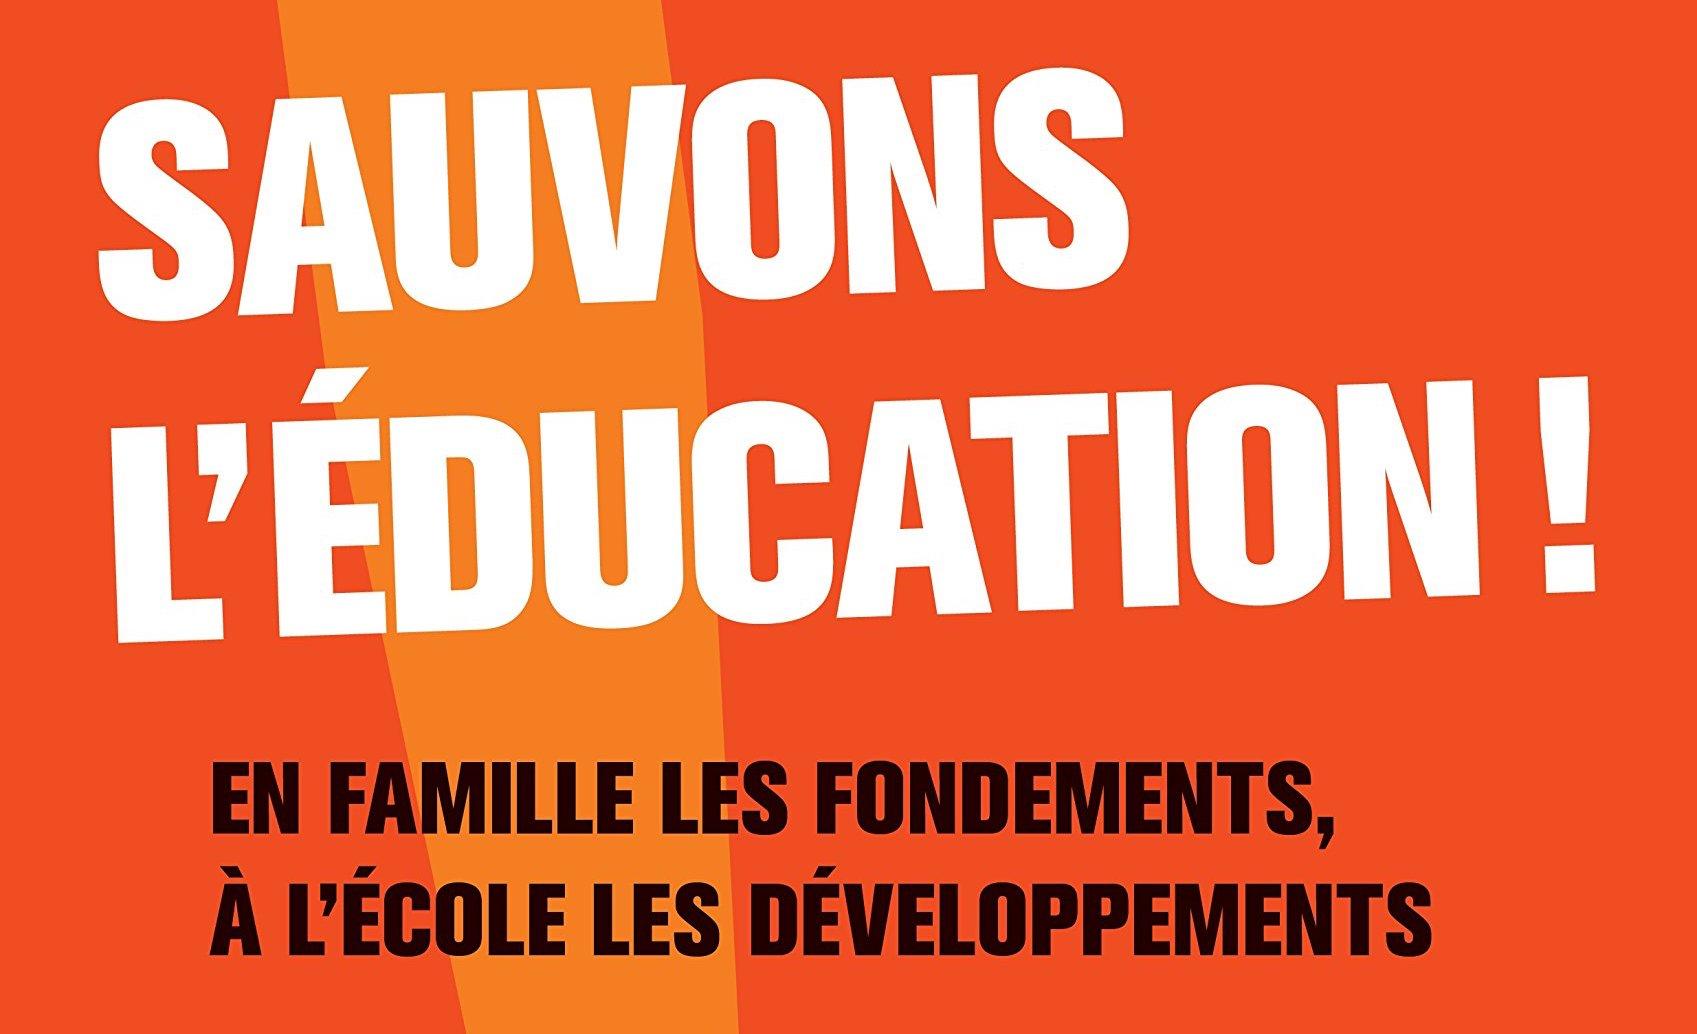 Sauvons l'éducation, Christian Flavigny